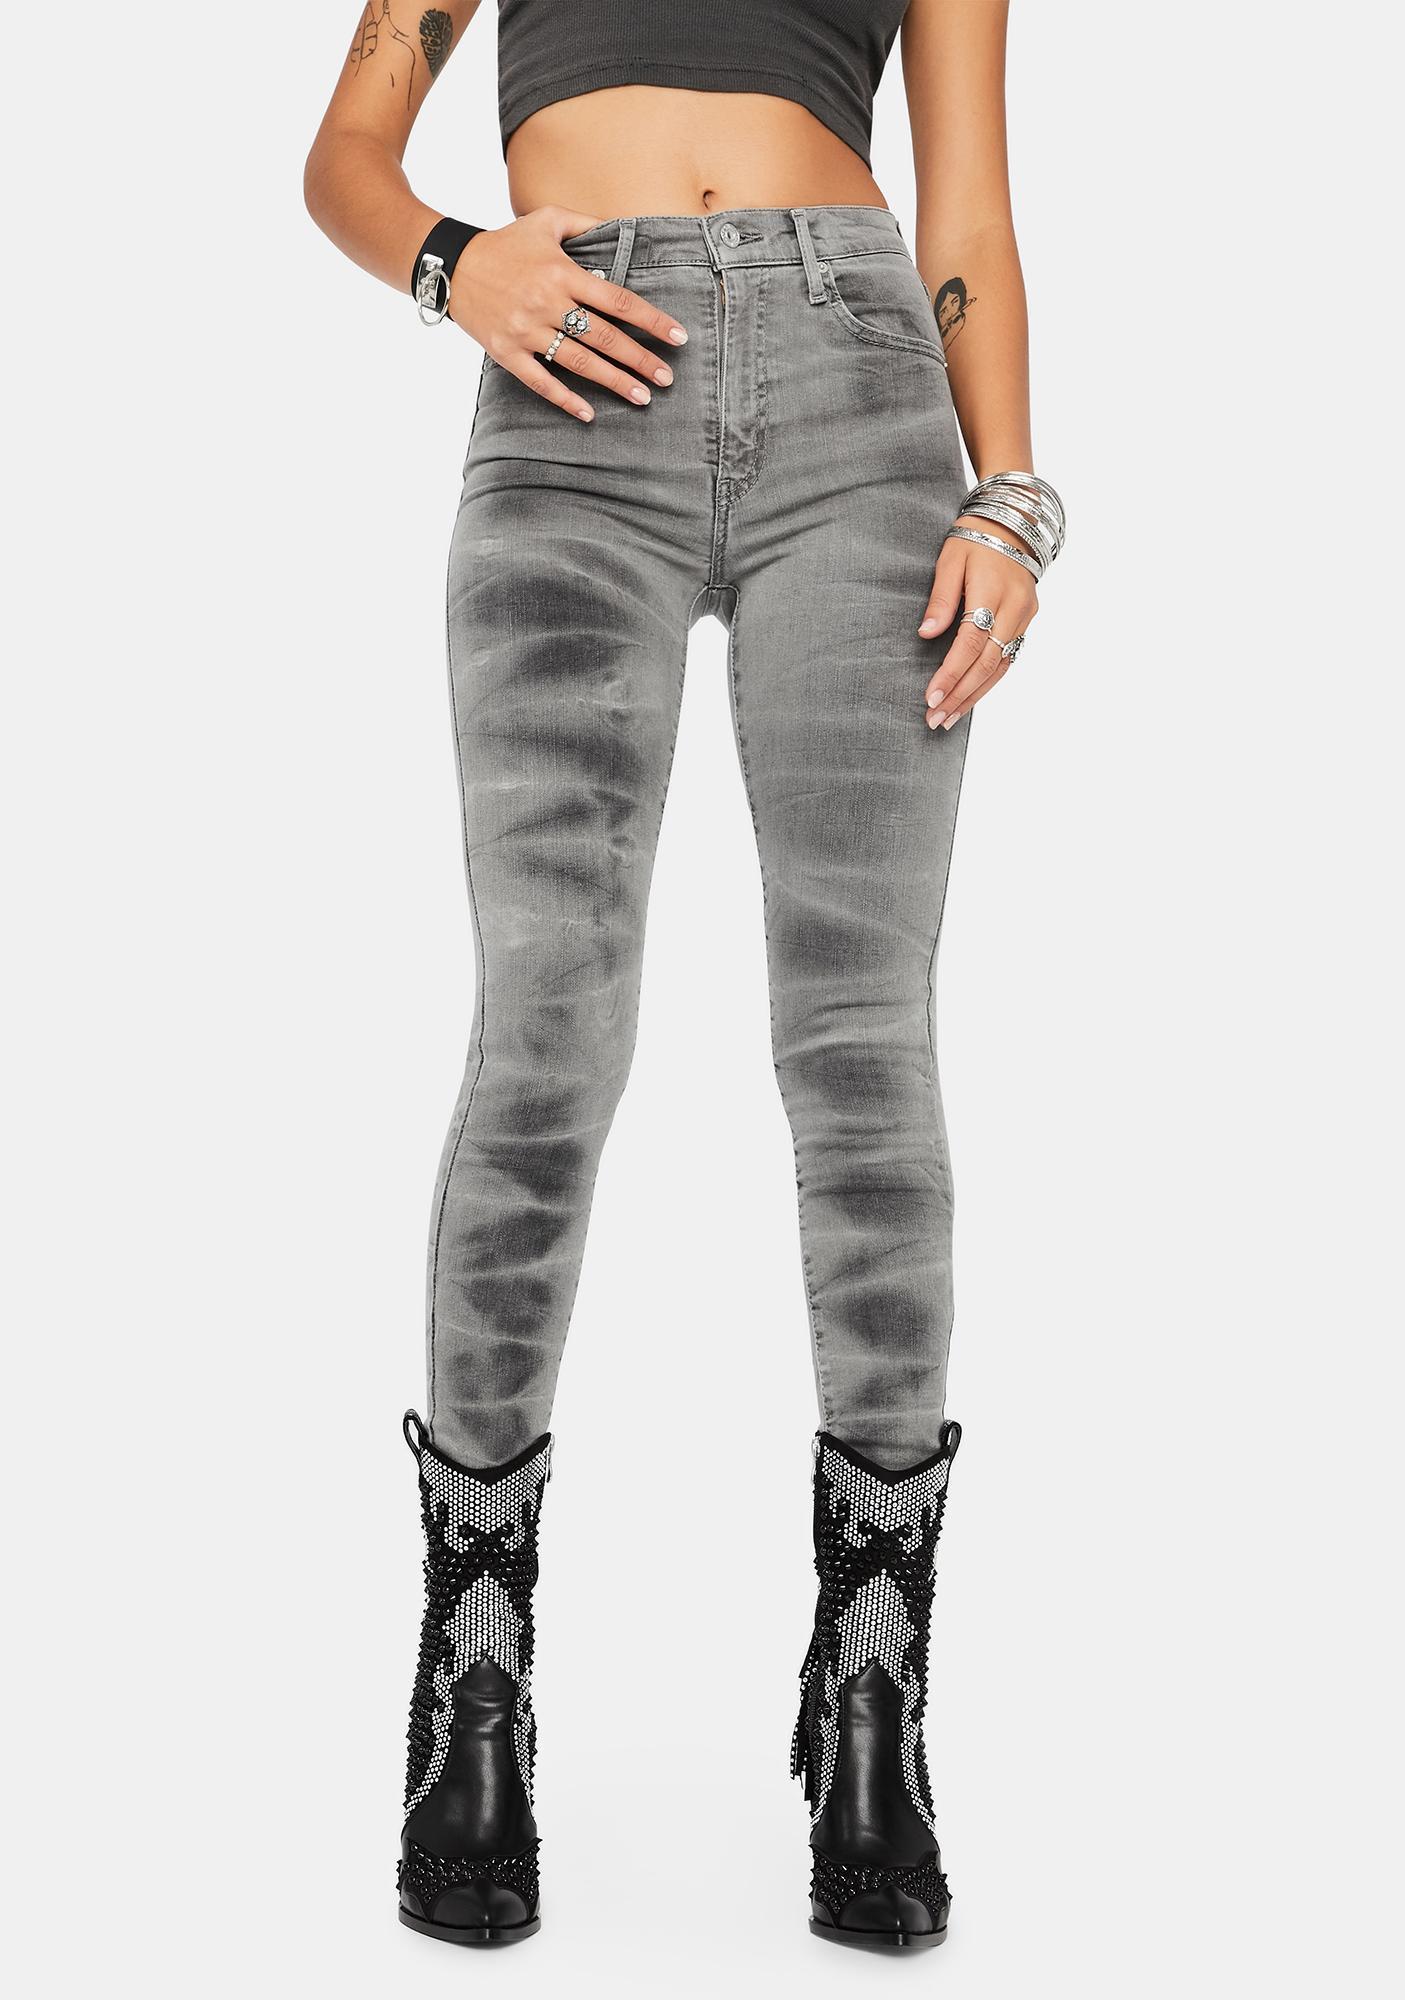 Levis Killin' It Mile High Super Skinny Jeans